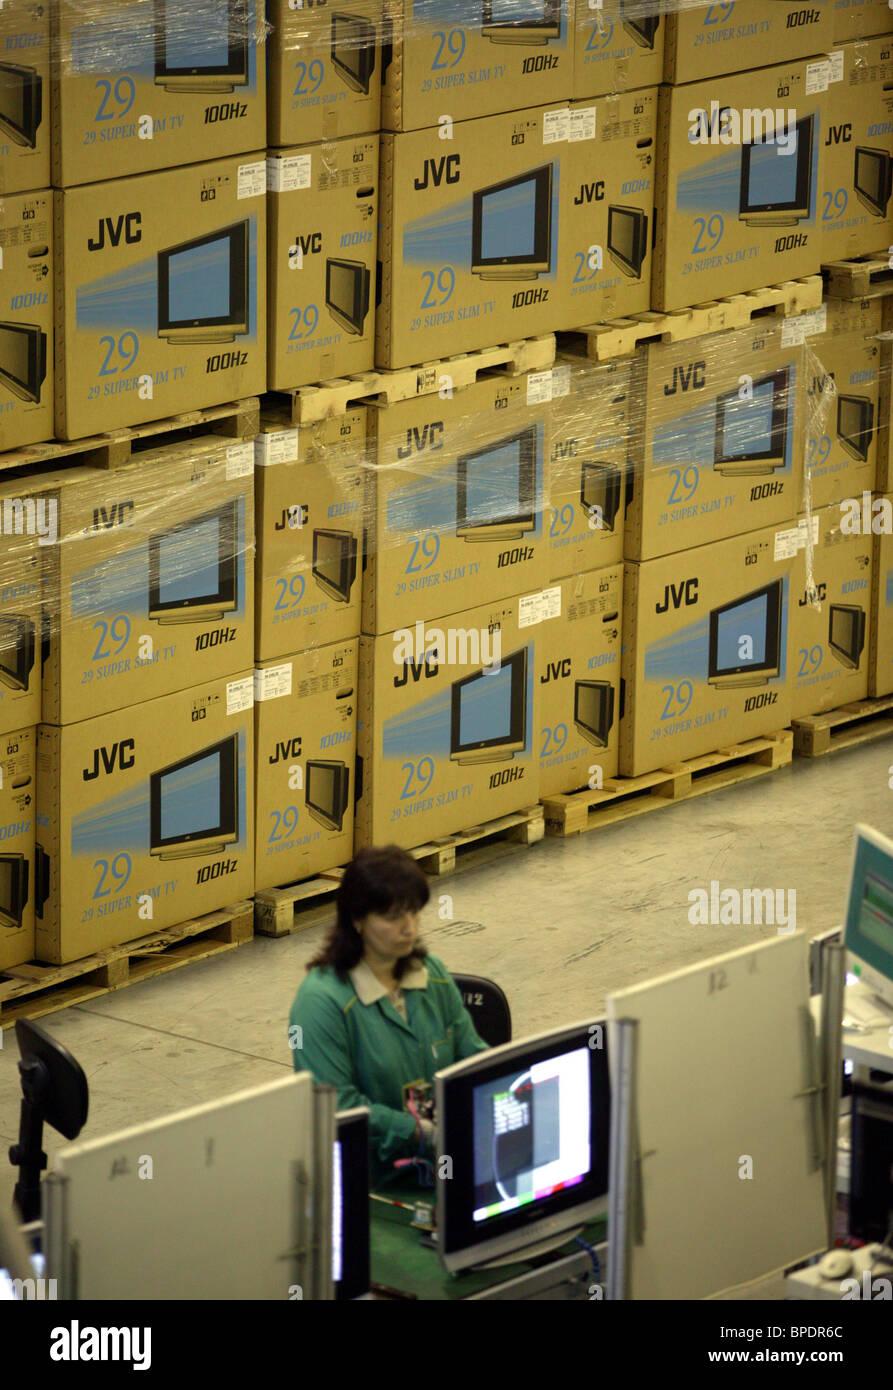 Telebalt LCD TV plant in Kaliningrad enclave - Stock Image